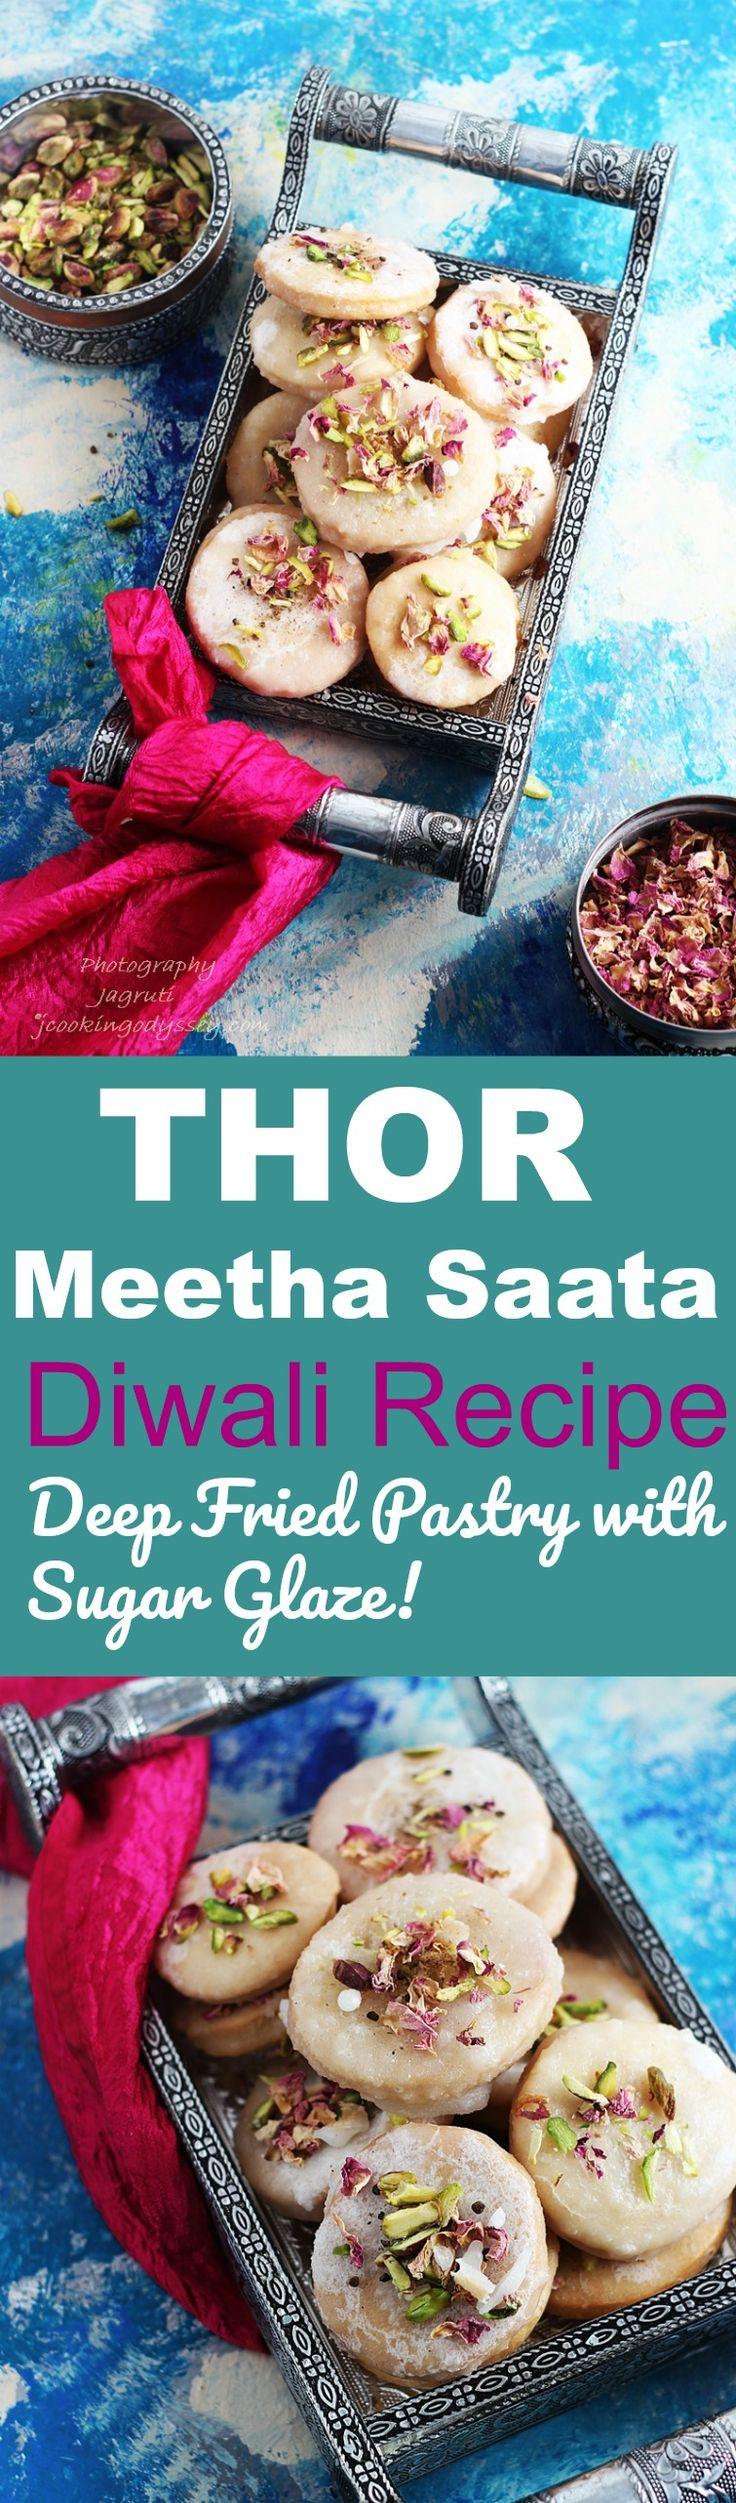 Thor-Meetha Saata-Diwali Recipe